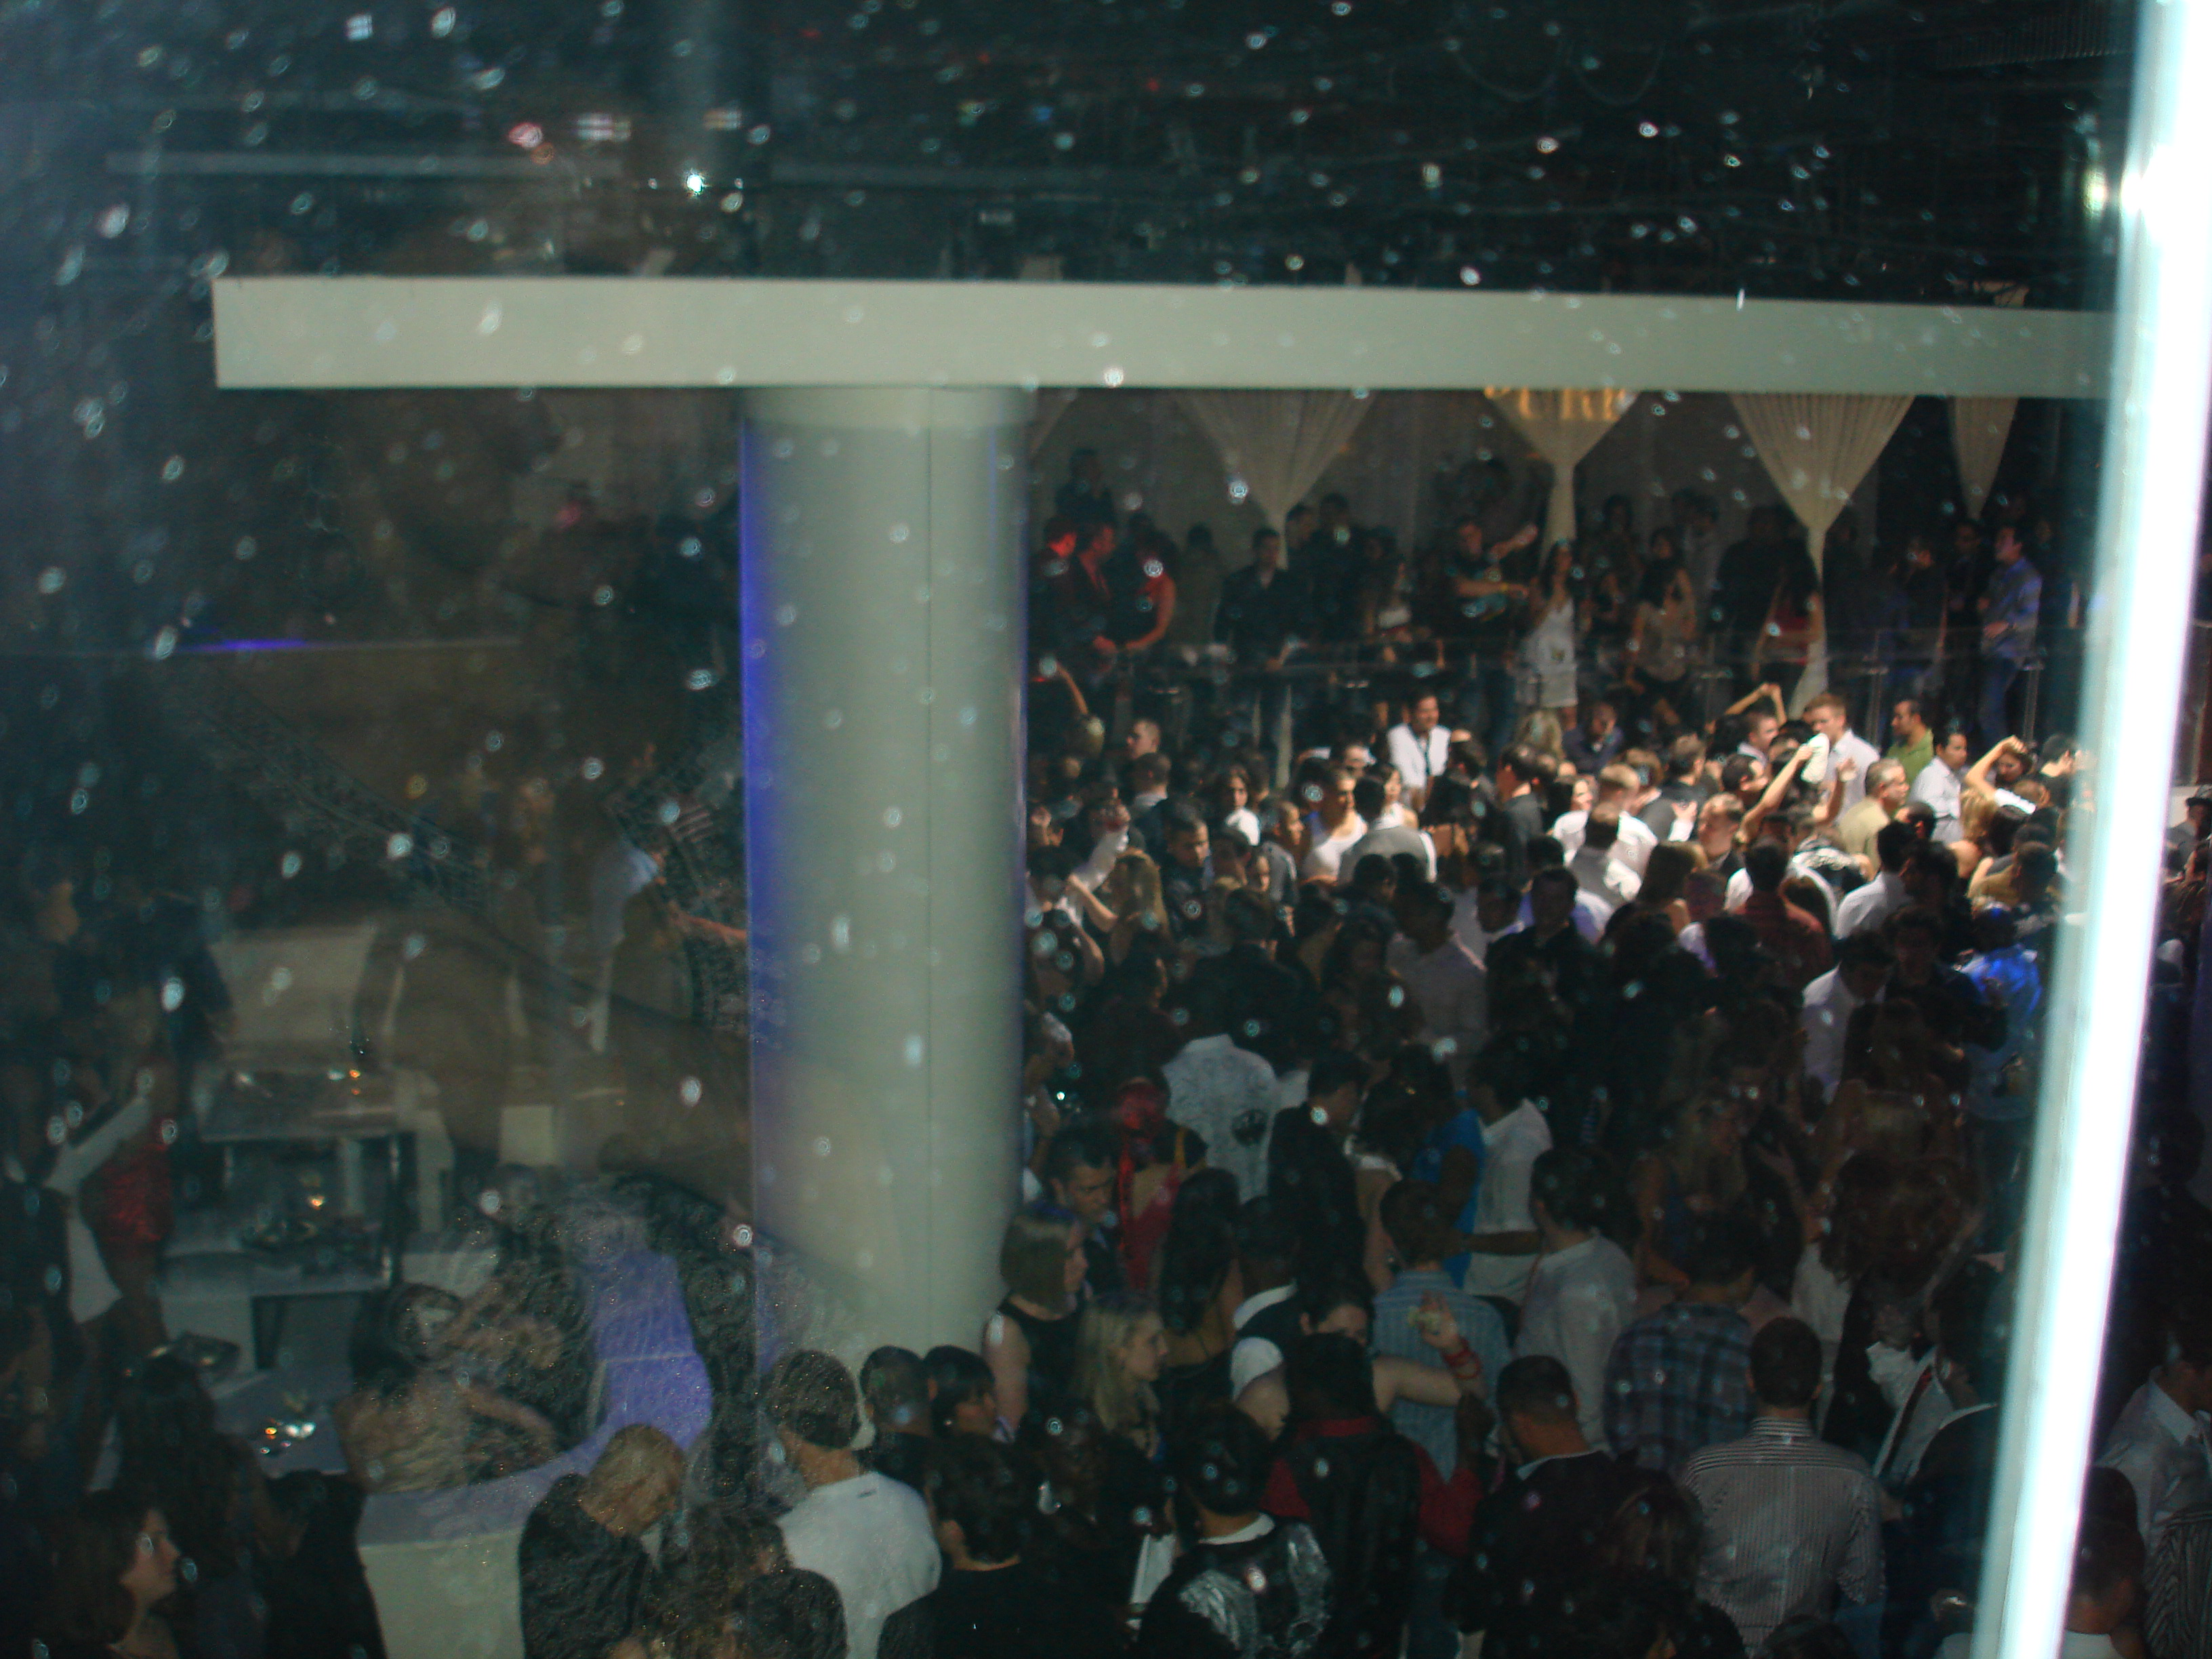 Pure Nightclub at 2am